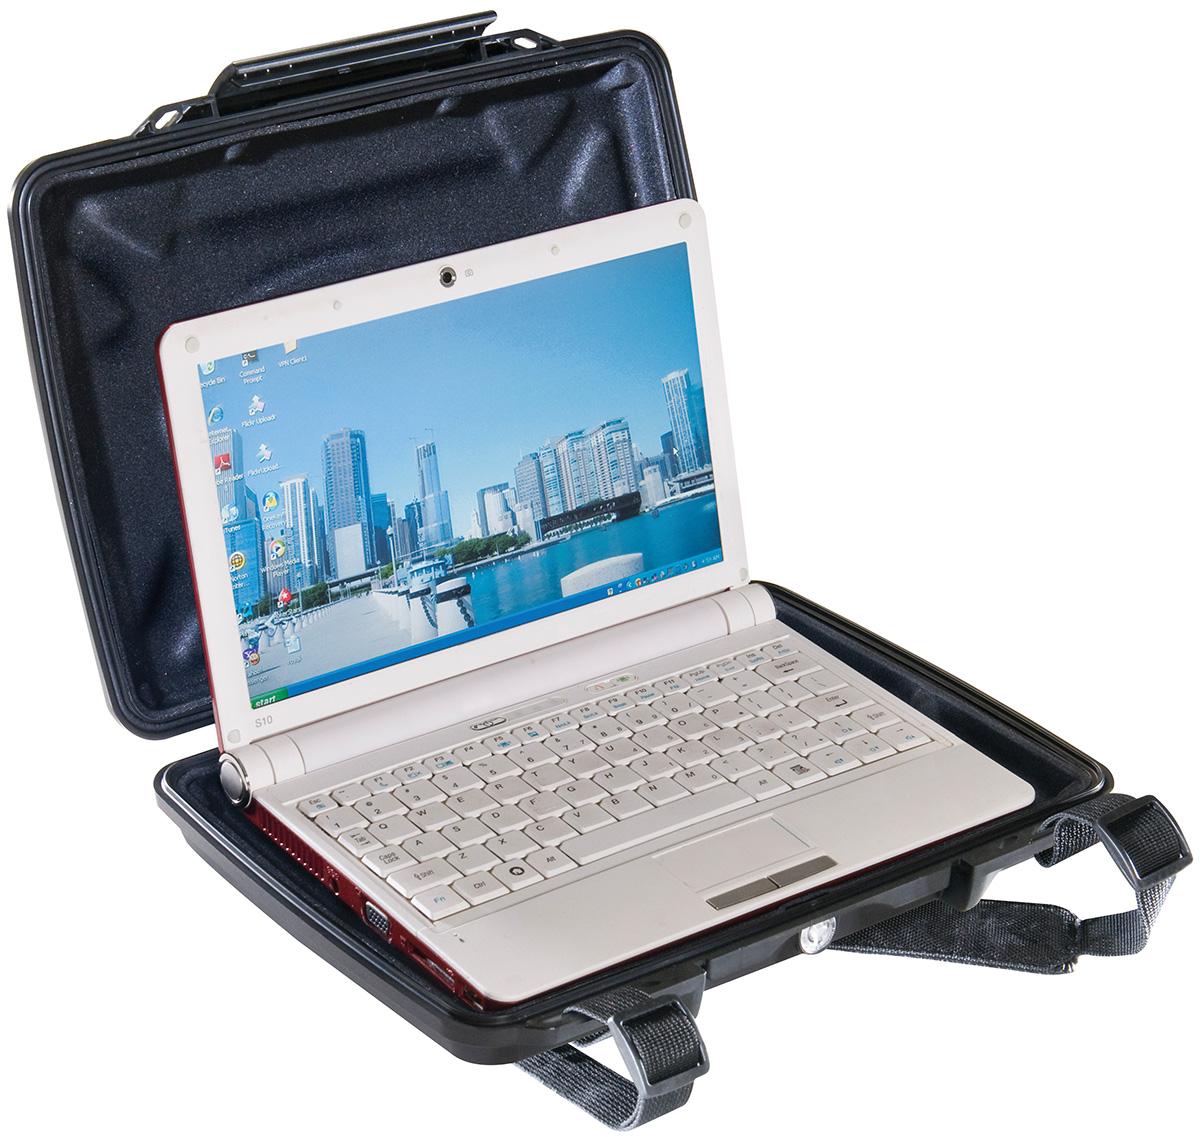 pelican peli products 1075CC hard 1075 laptop waterproof case